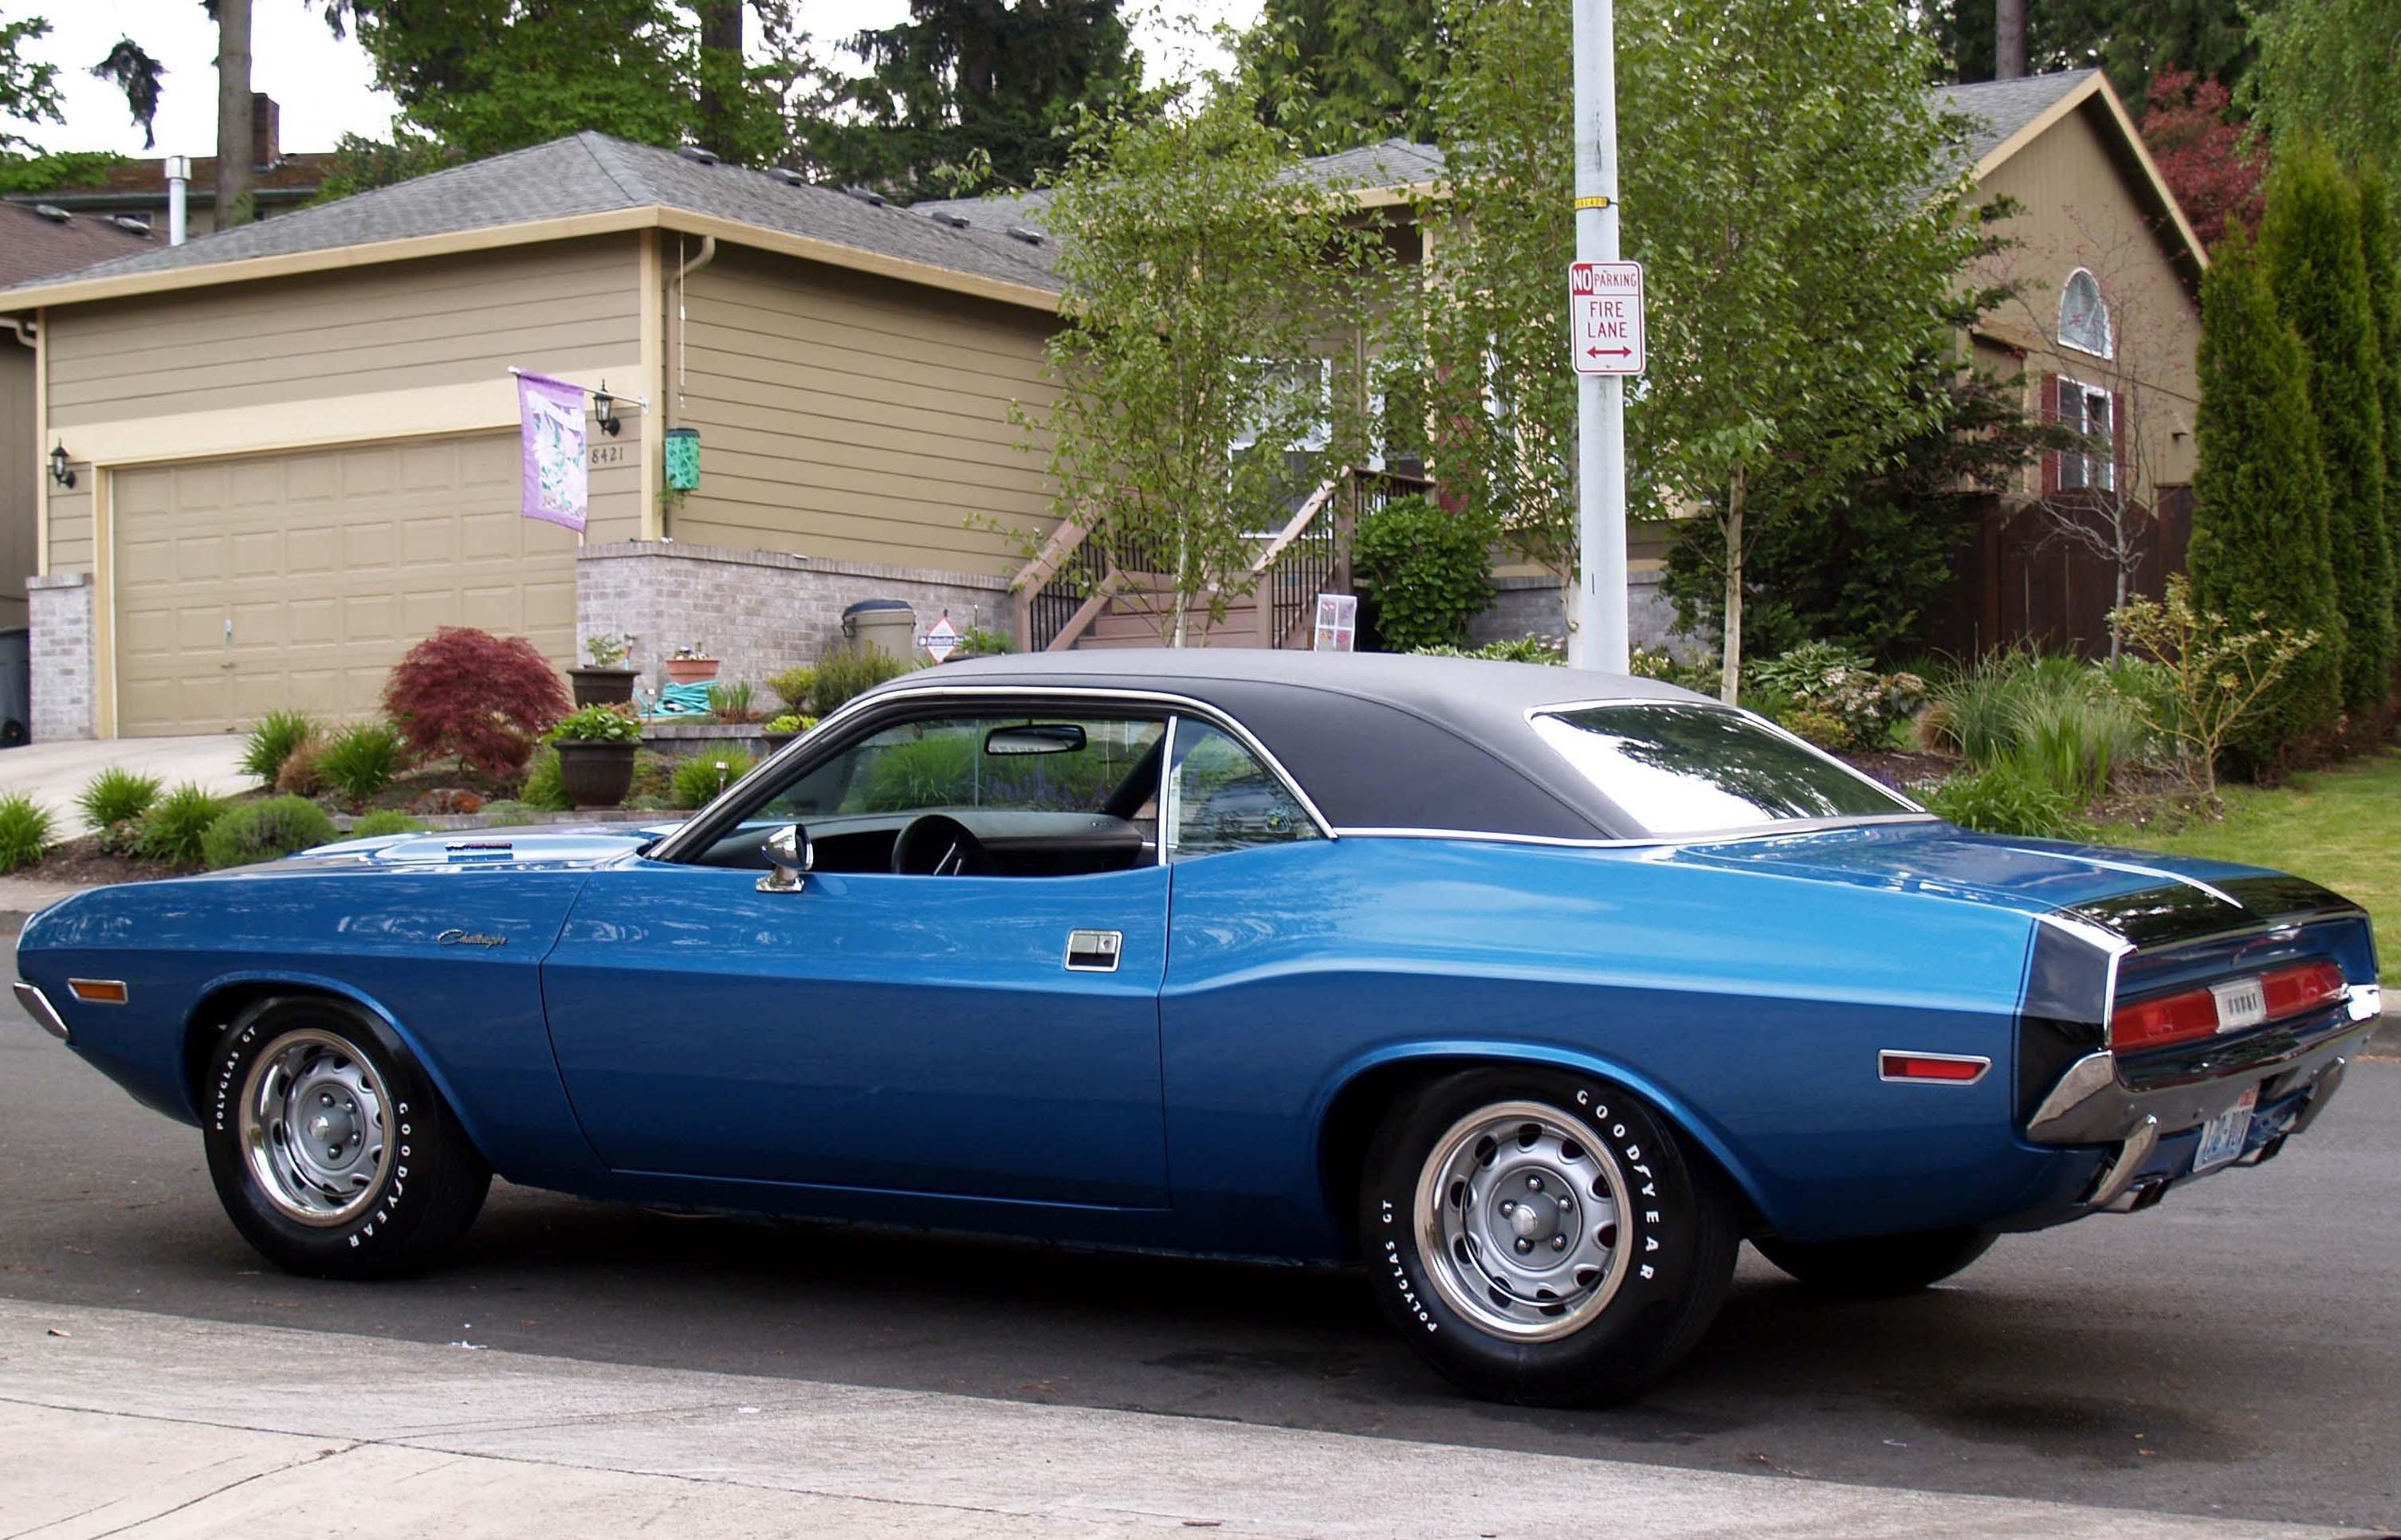 Dodge Challenger Rt 2017 >> 1970 challenger classic Dodge muscle cars wallpaper   3012x1932   513059   WallpaperUP